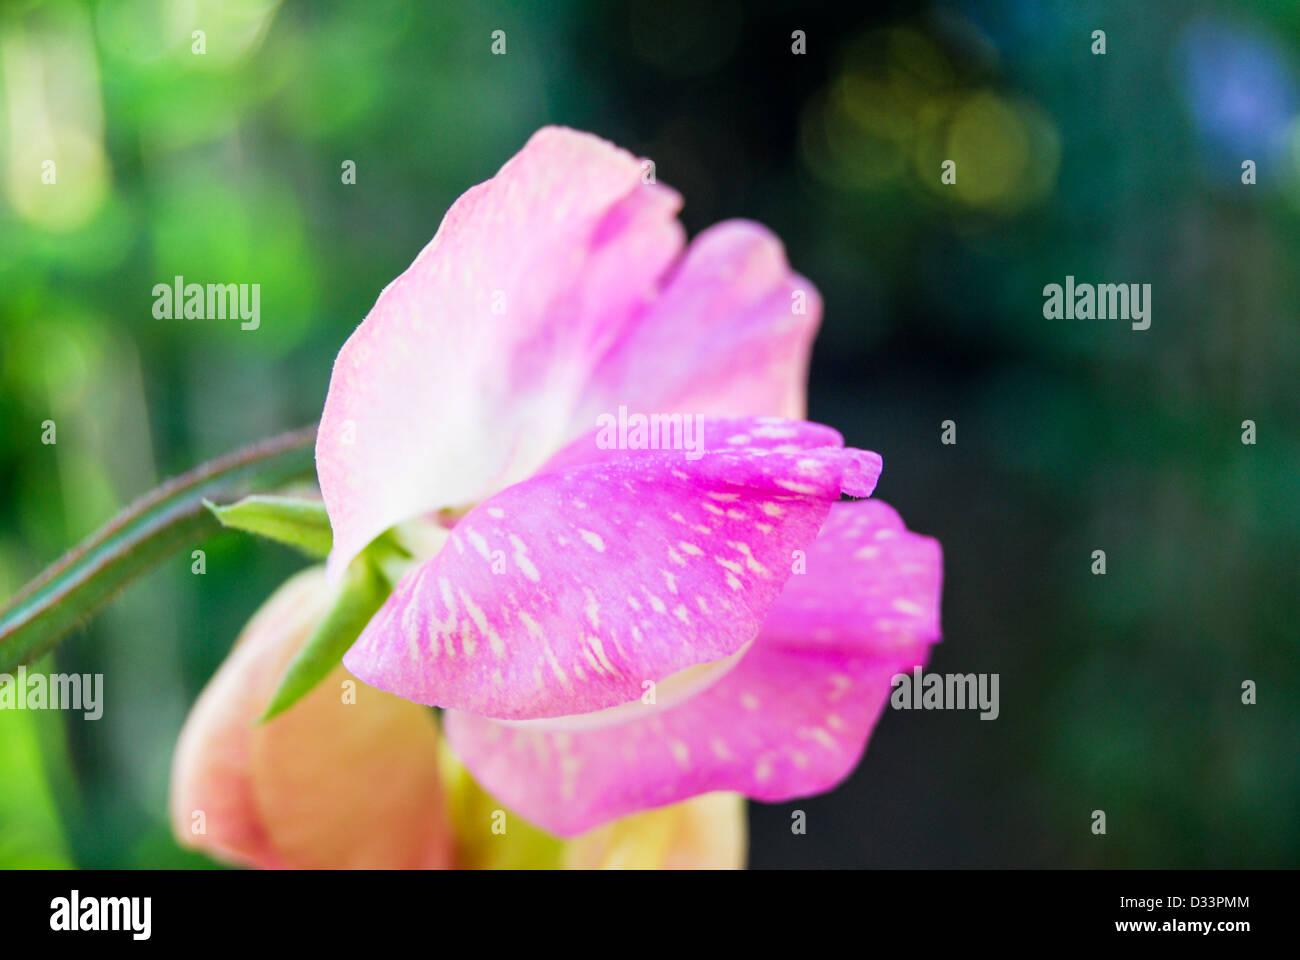 Duftende Platterbse Blüte zeigt virus Stockbild